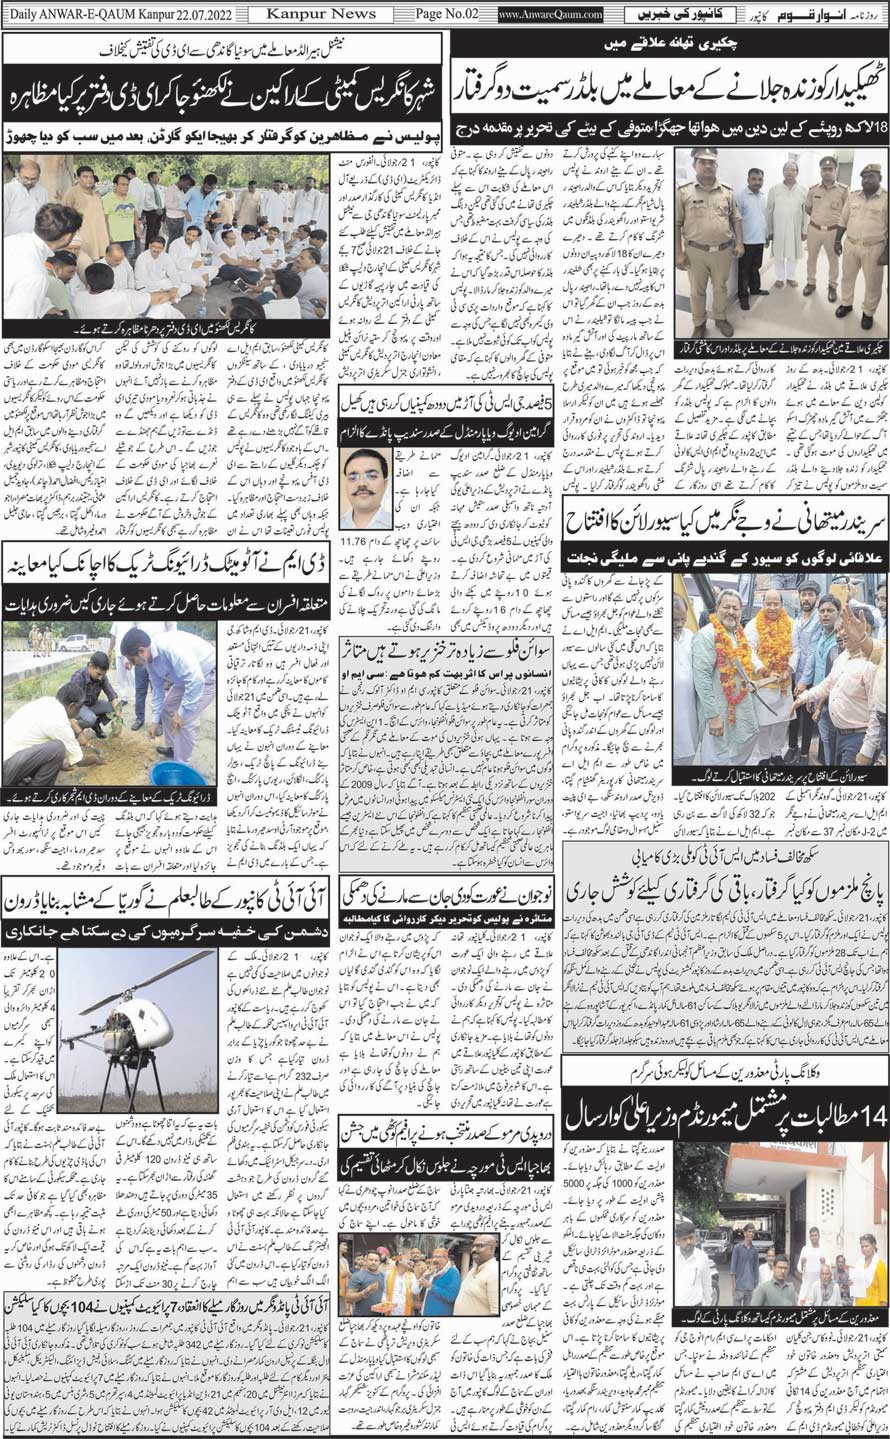 Anwar-E-Qaum, Urdu Daily, Published From Kanpur, Lucknow, Fatehpur, Uttar Pradesh, India